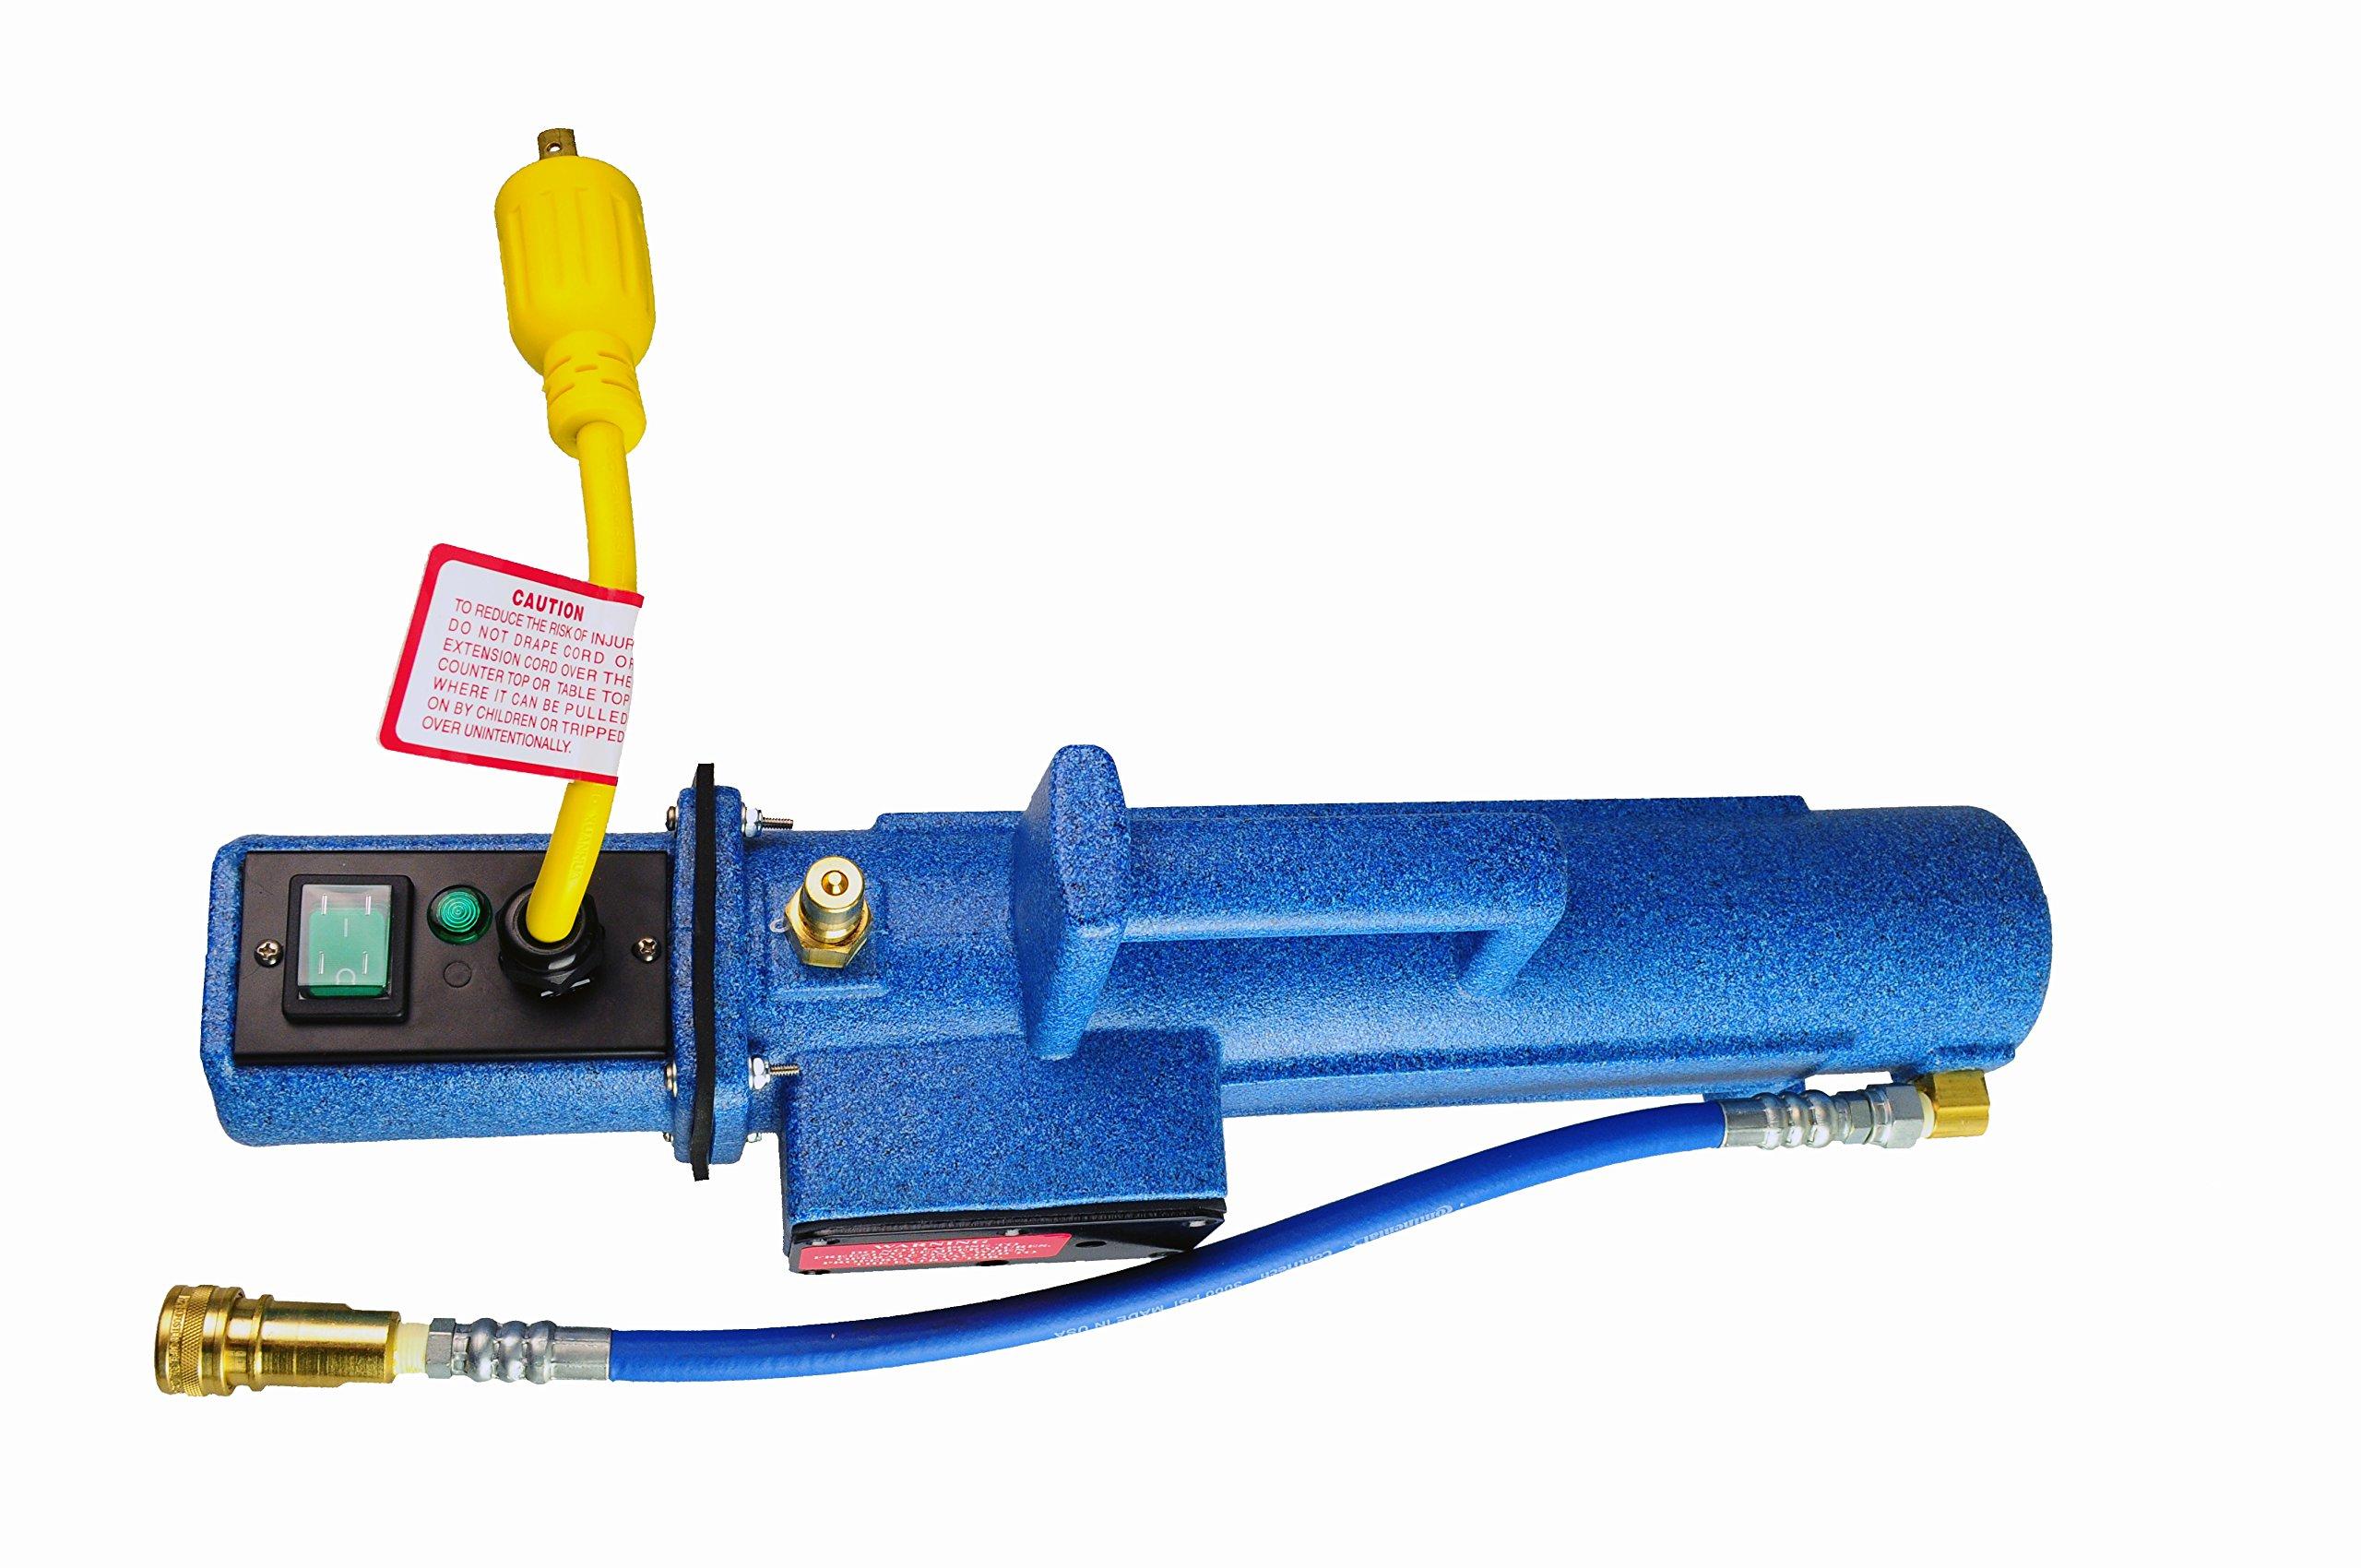 EDIC Heat 'N Run External Heater System by EDIC